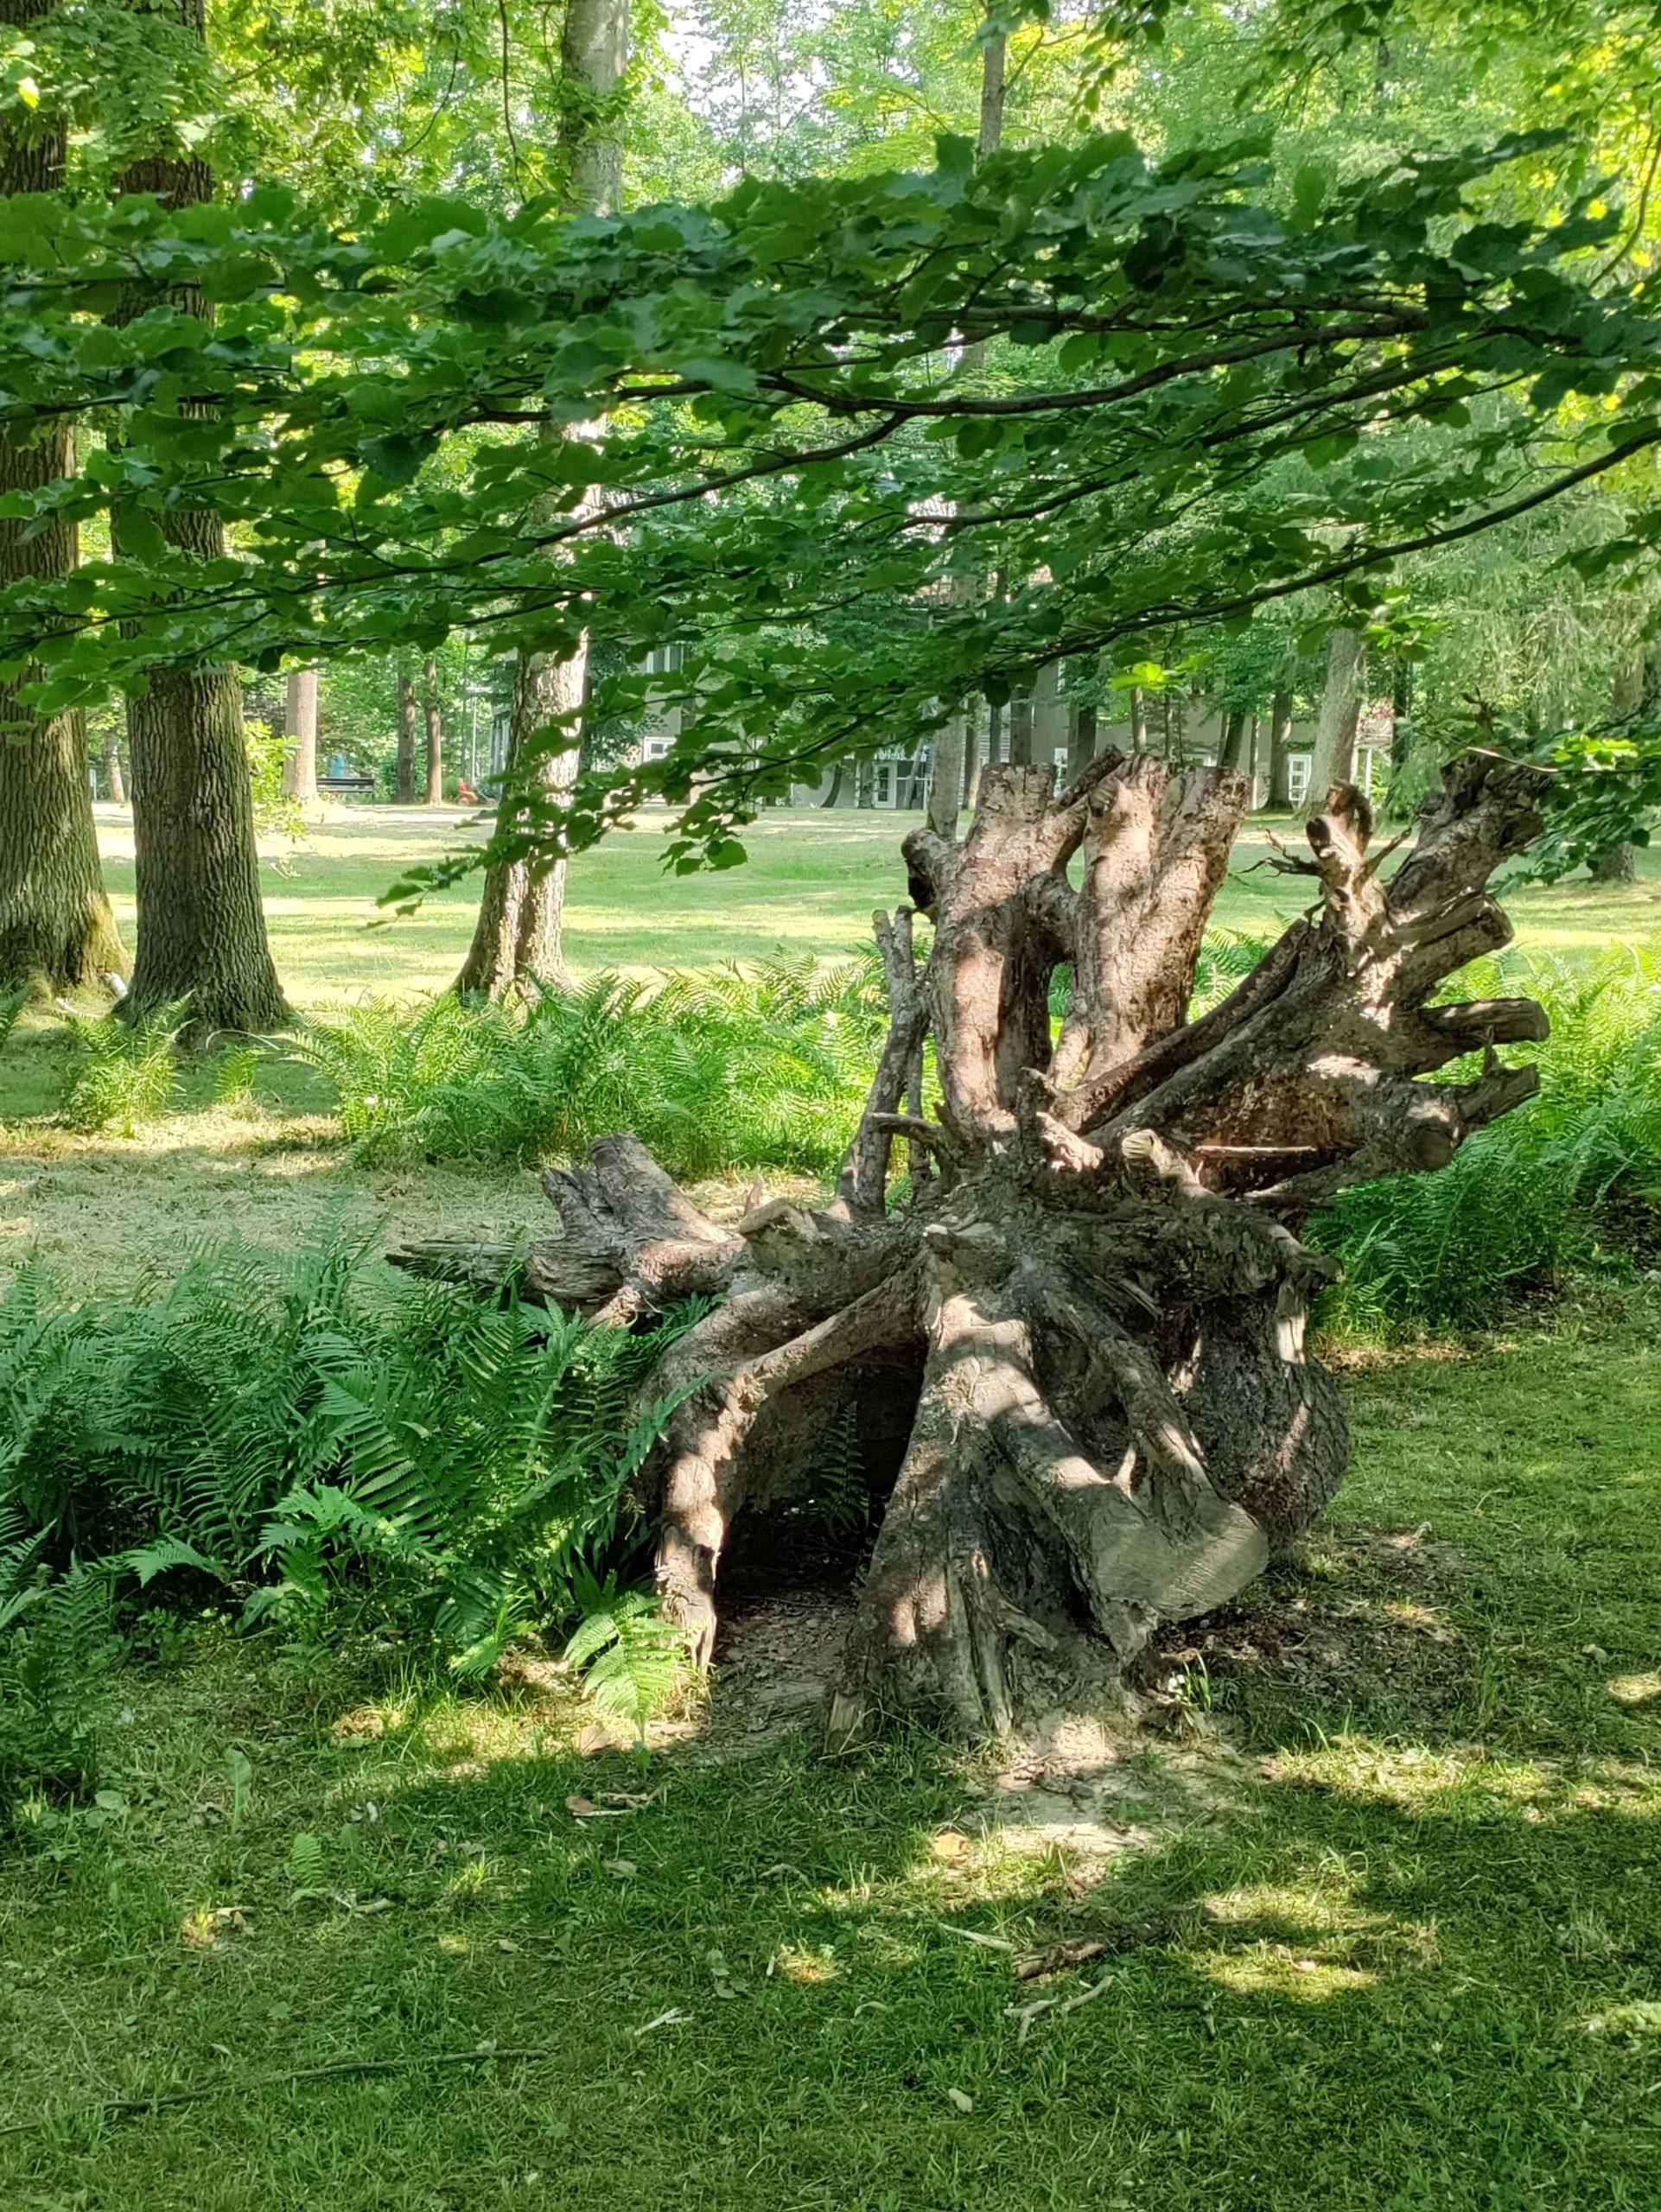 Nord CE 5G drzewo konary